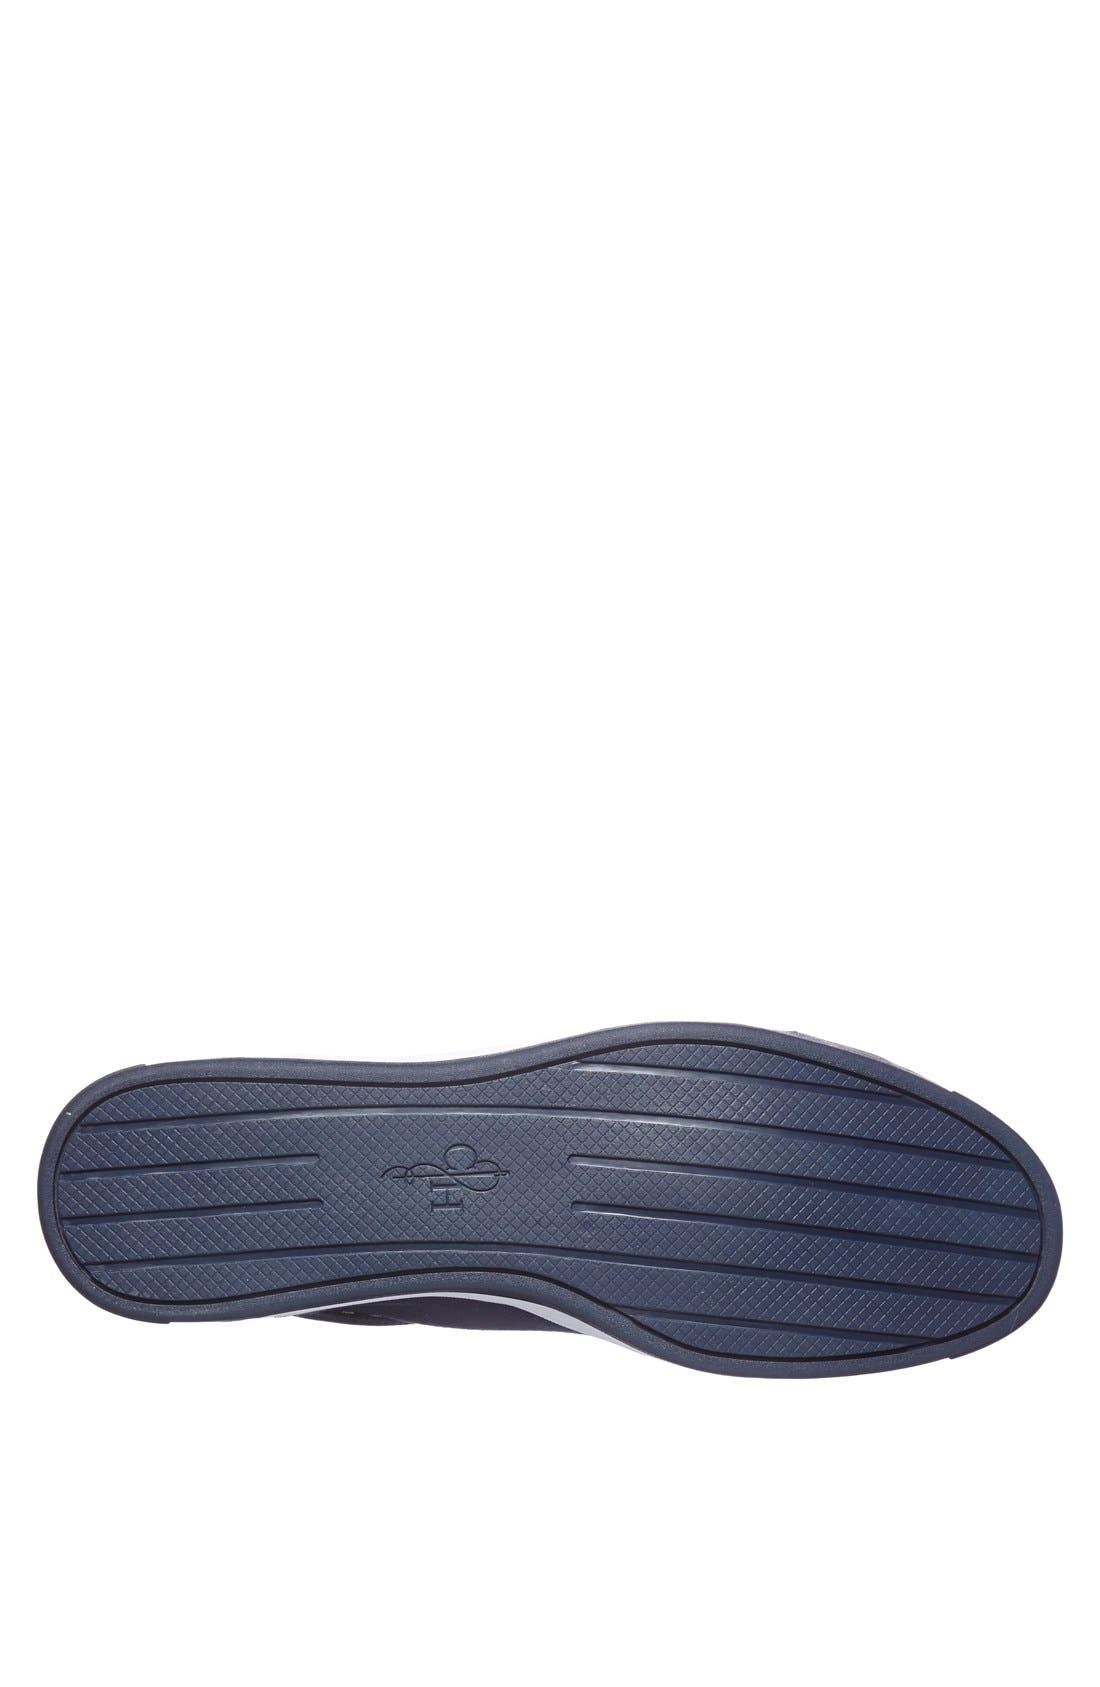 'Vartan Sport Oxford' Sneaker,                             Alternate thumbnail 43, color,